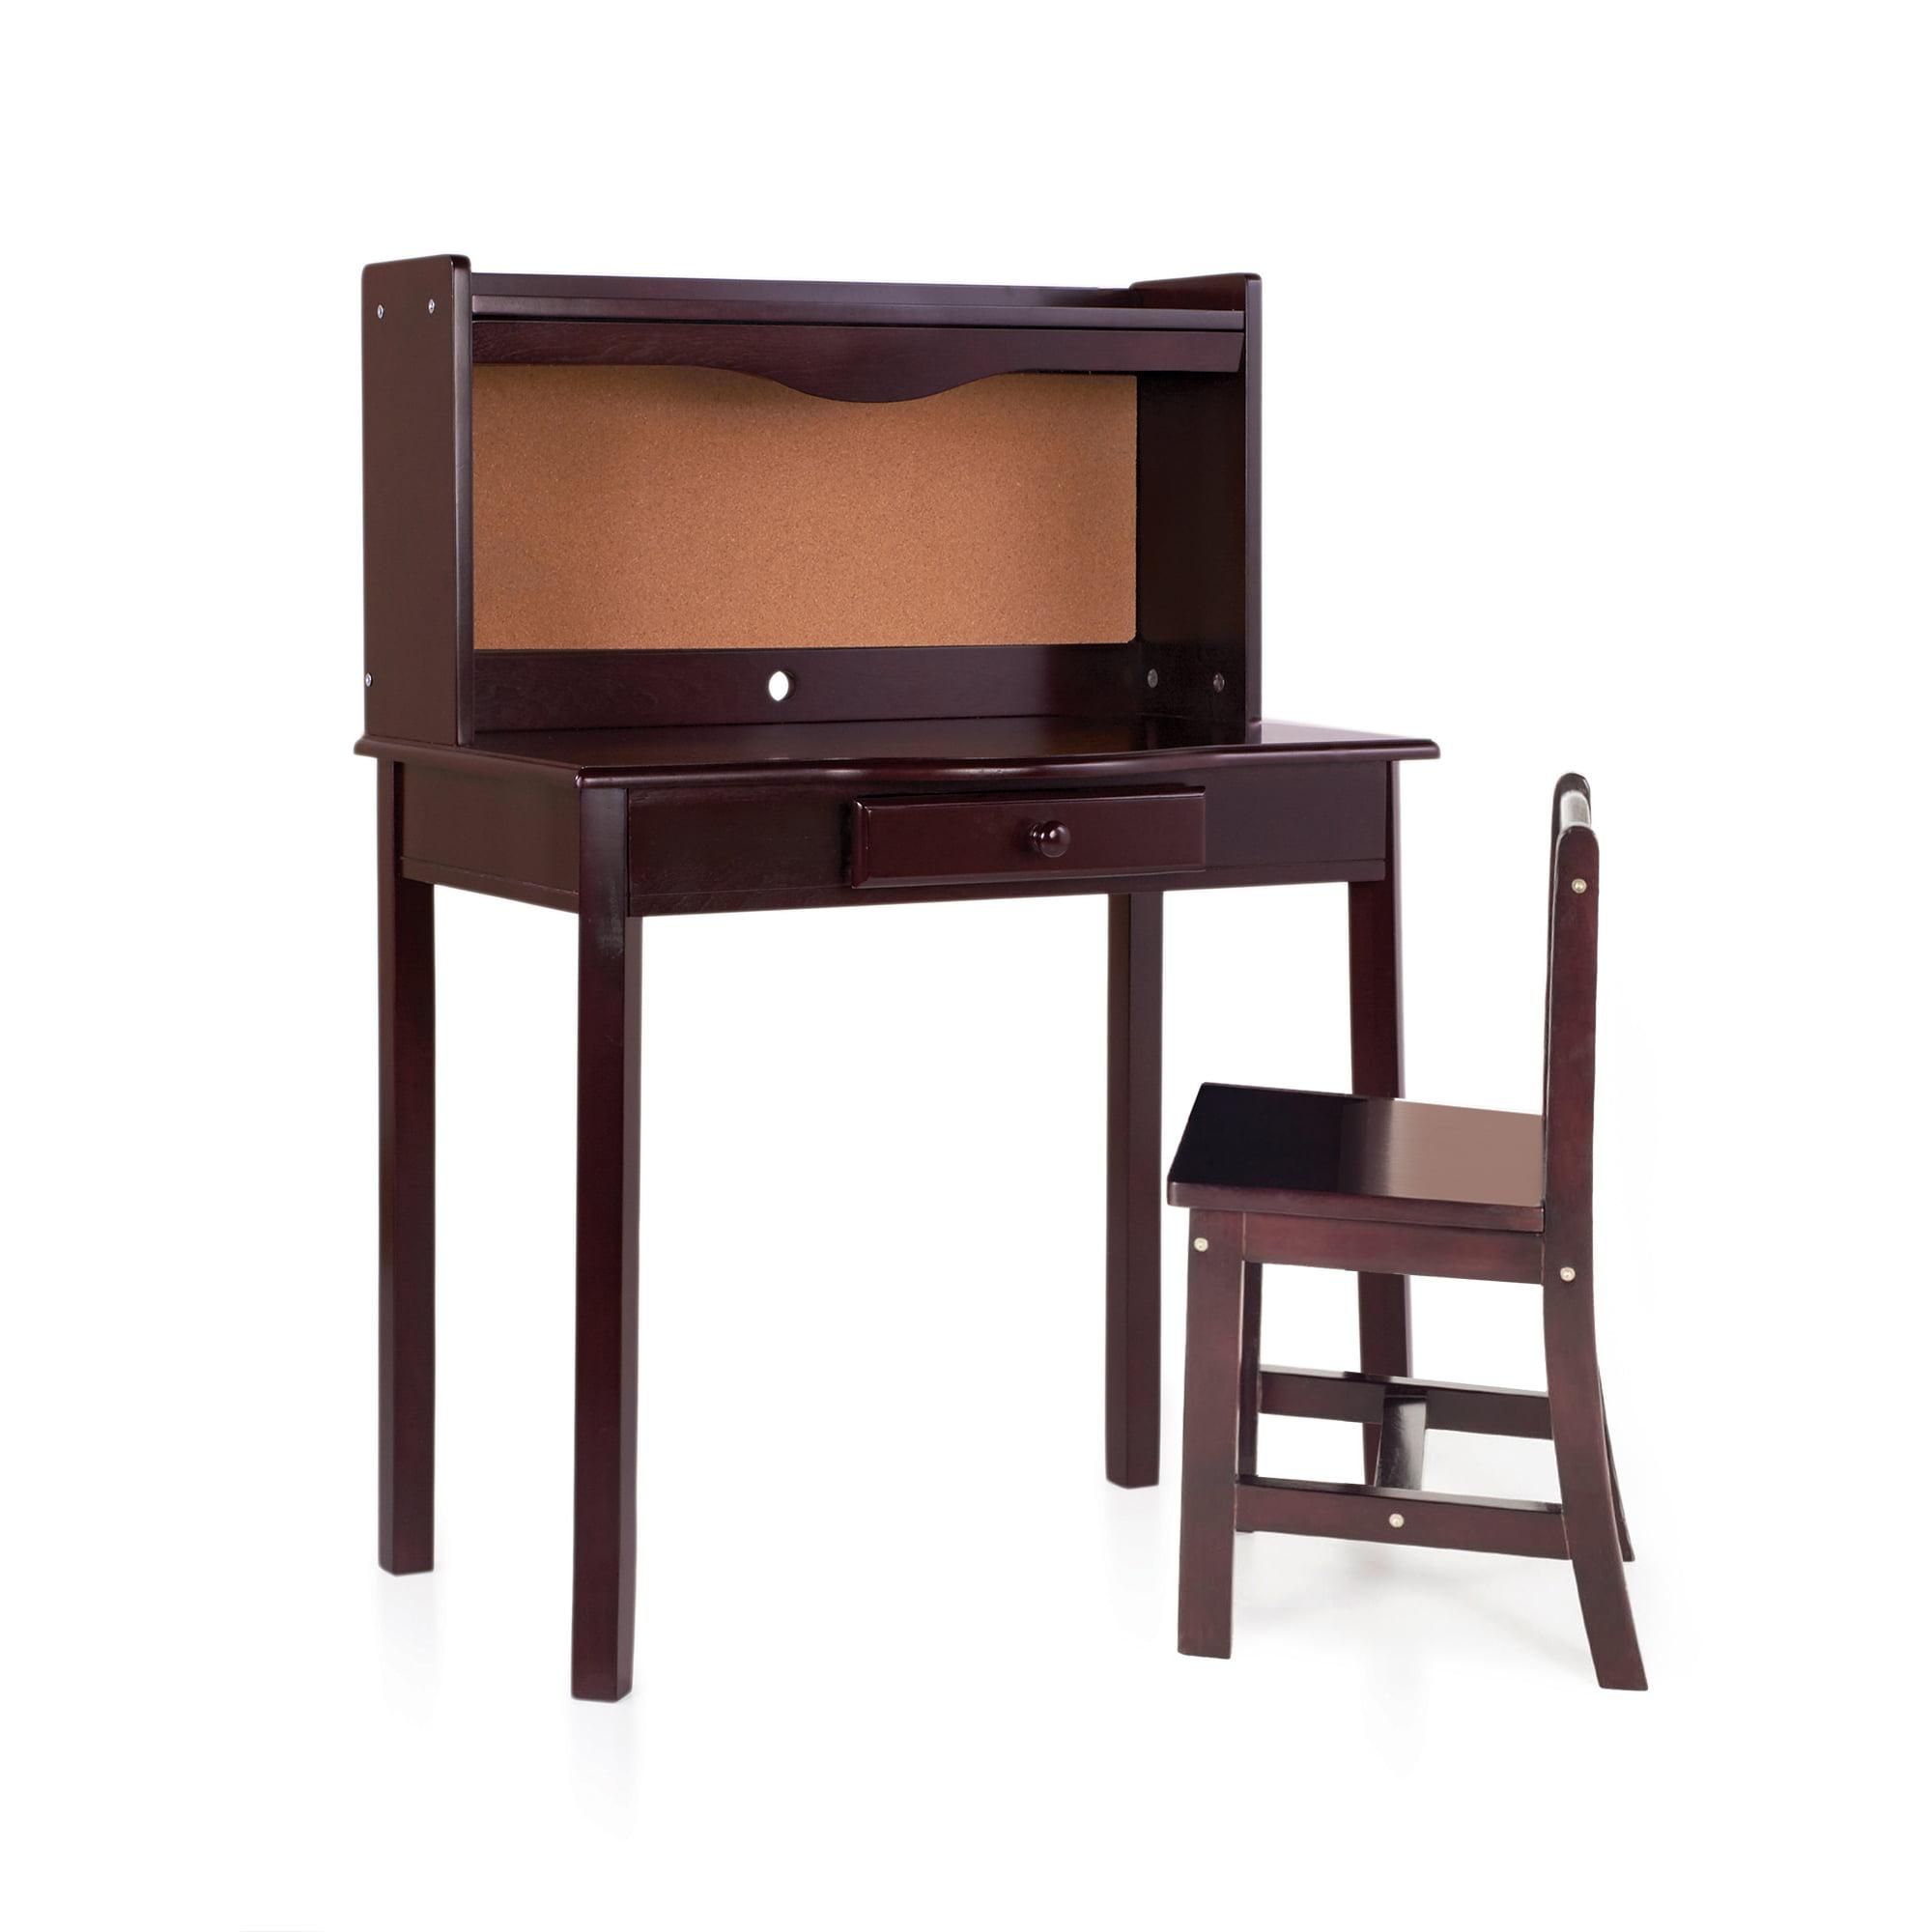 Guidecraft Classic Desk - Espresso